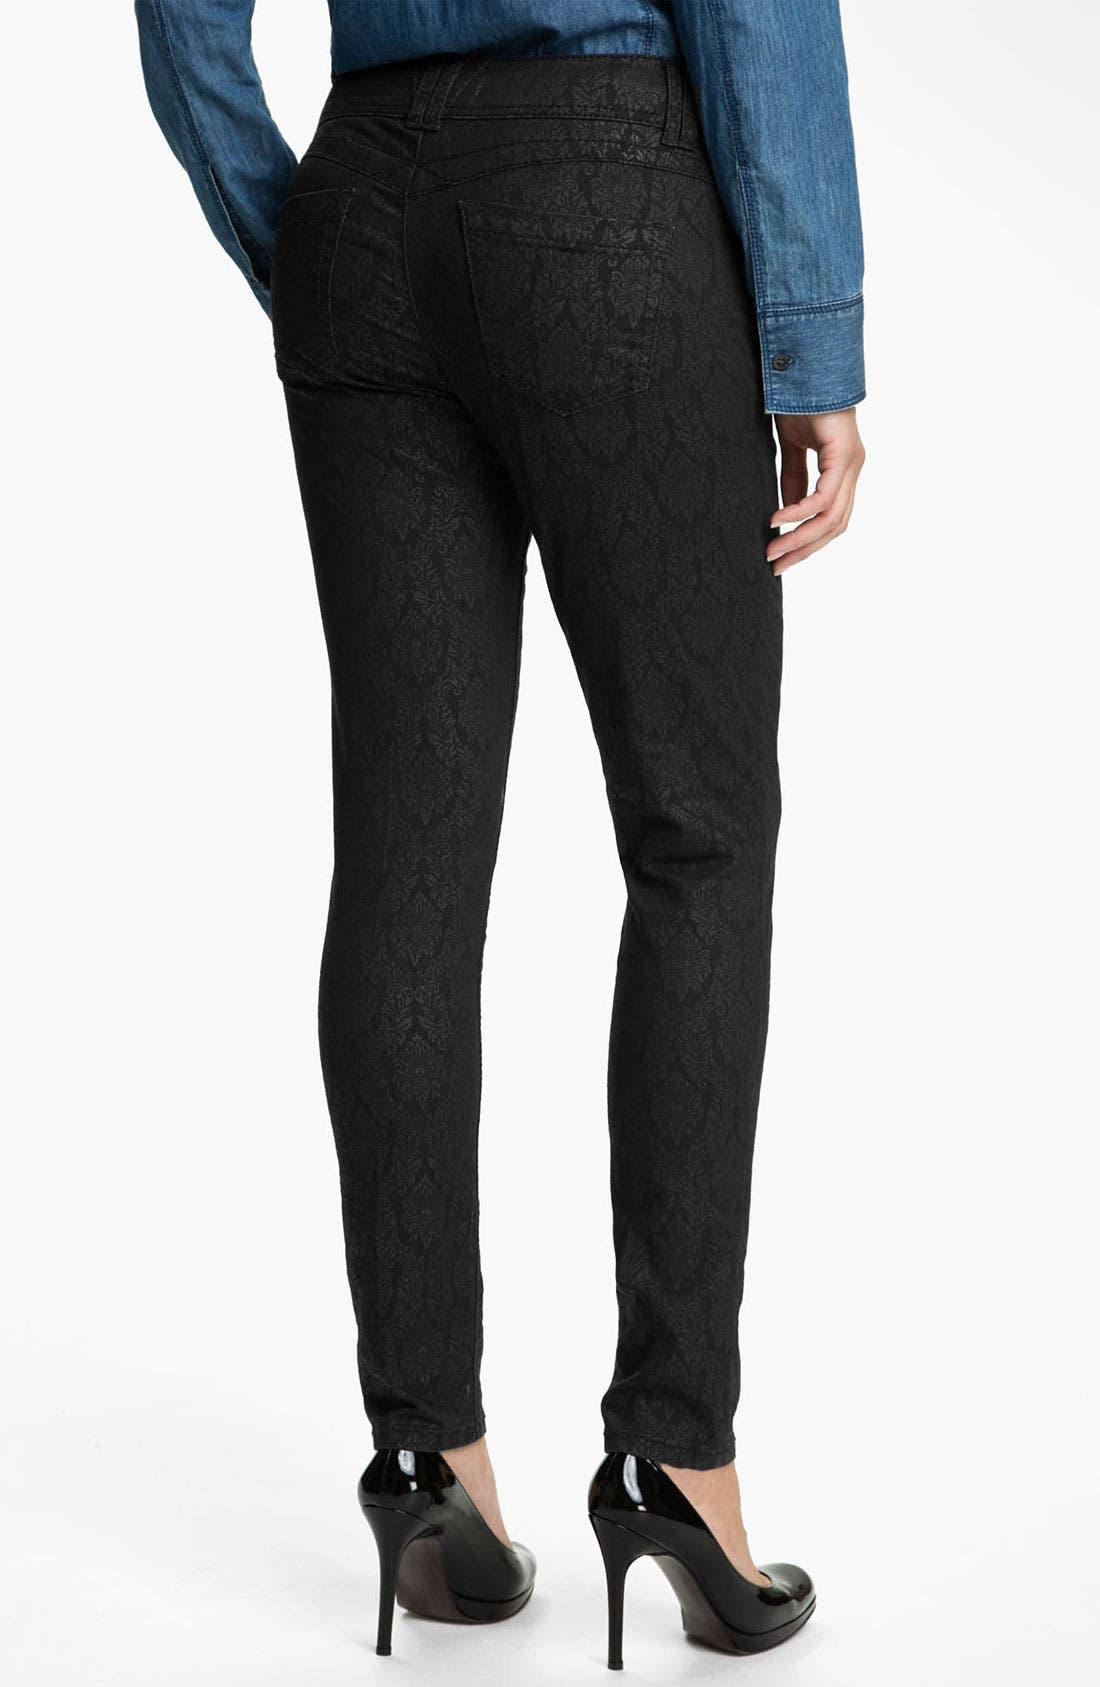 Alternate Image 2  - Wit & Wisdom Brocade Print Skinny Jeans (Black) (Nordstrom Exclusive)